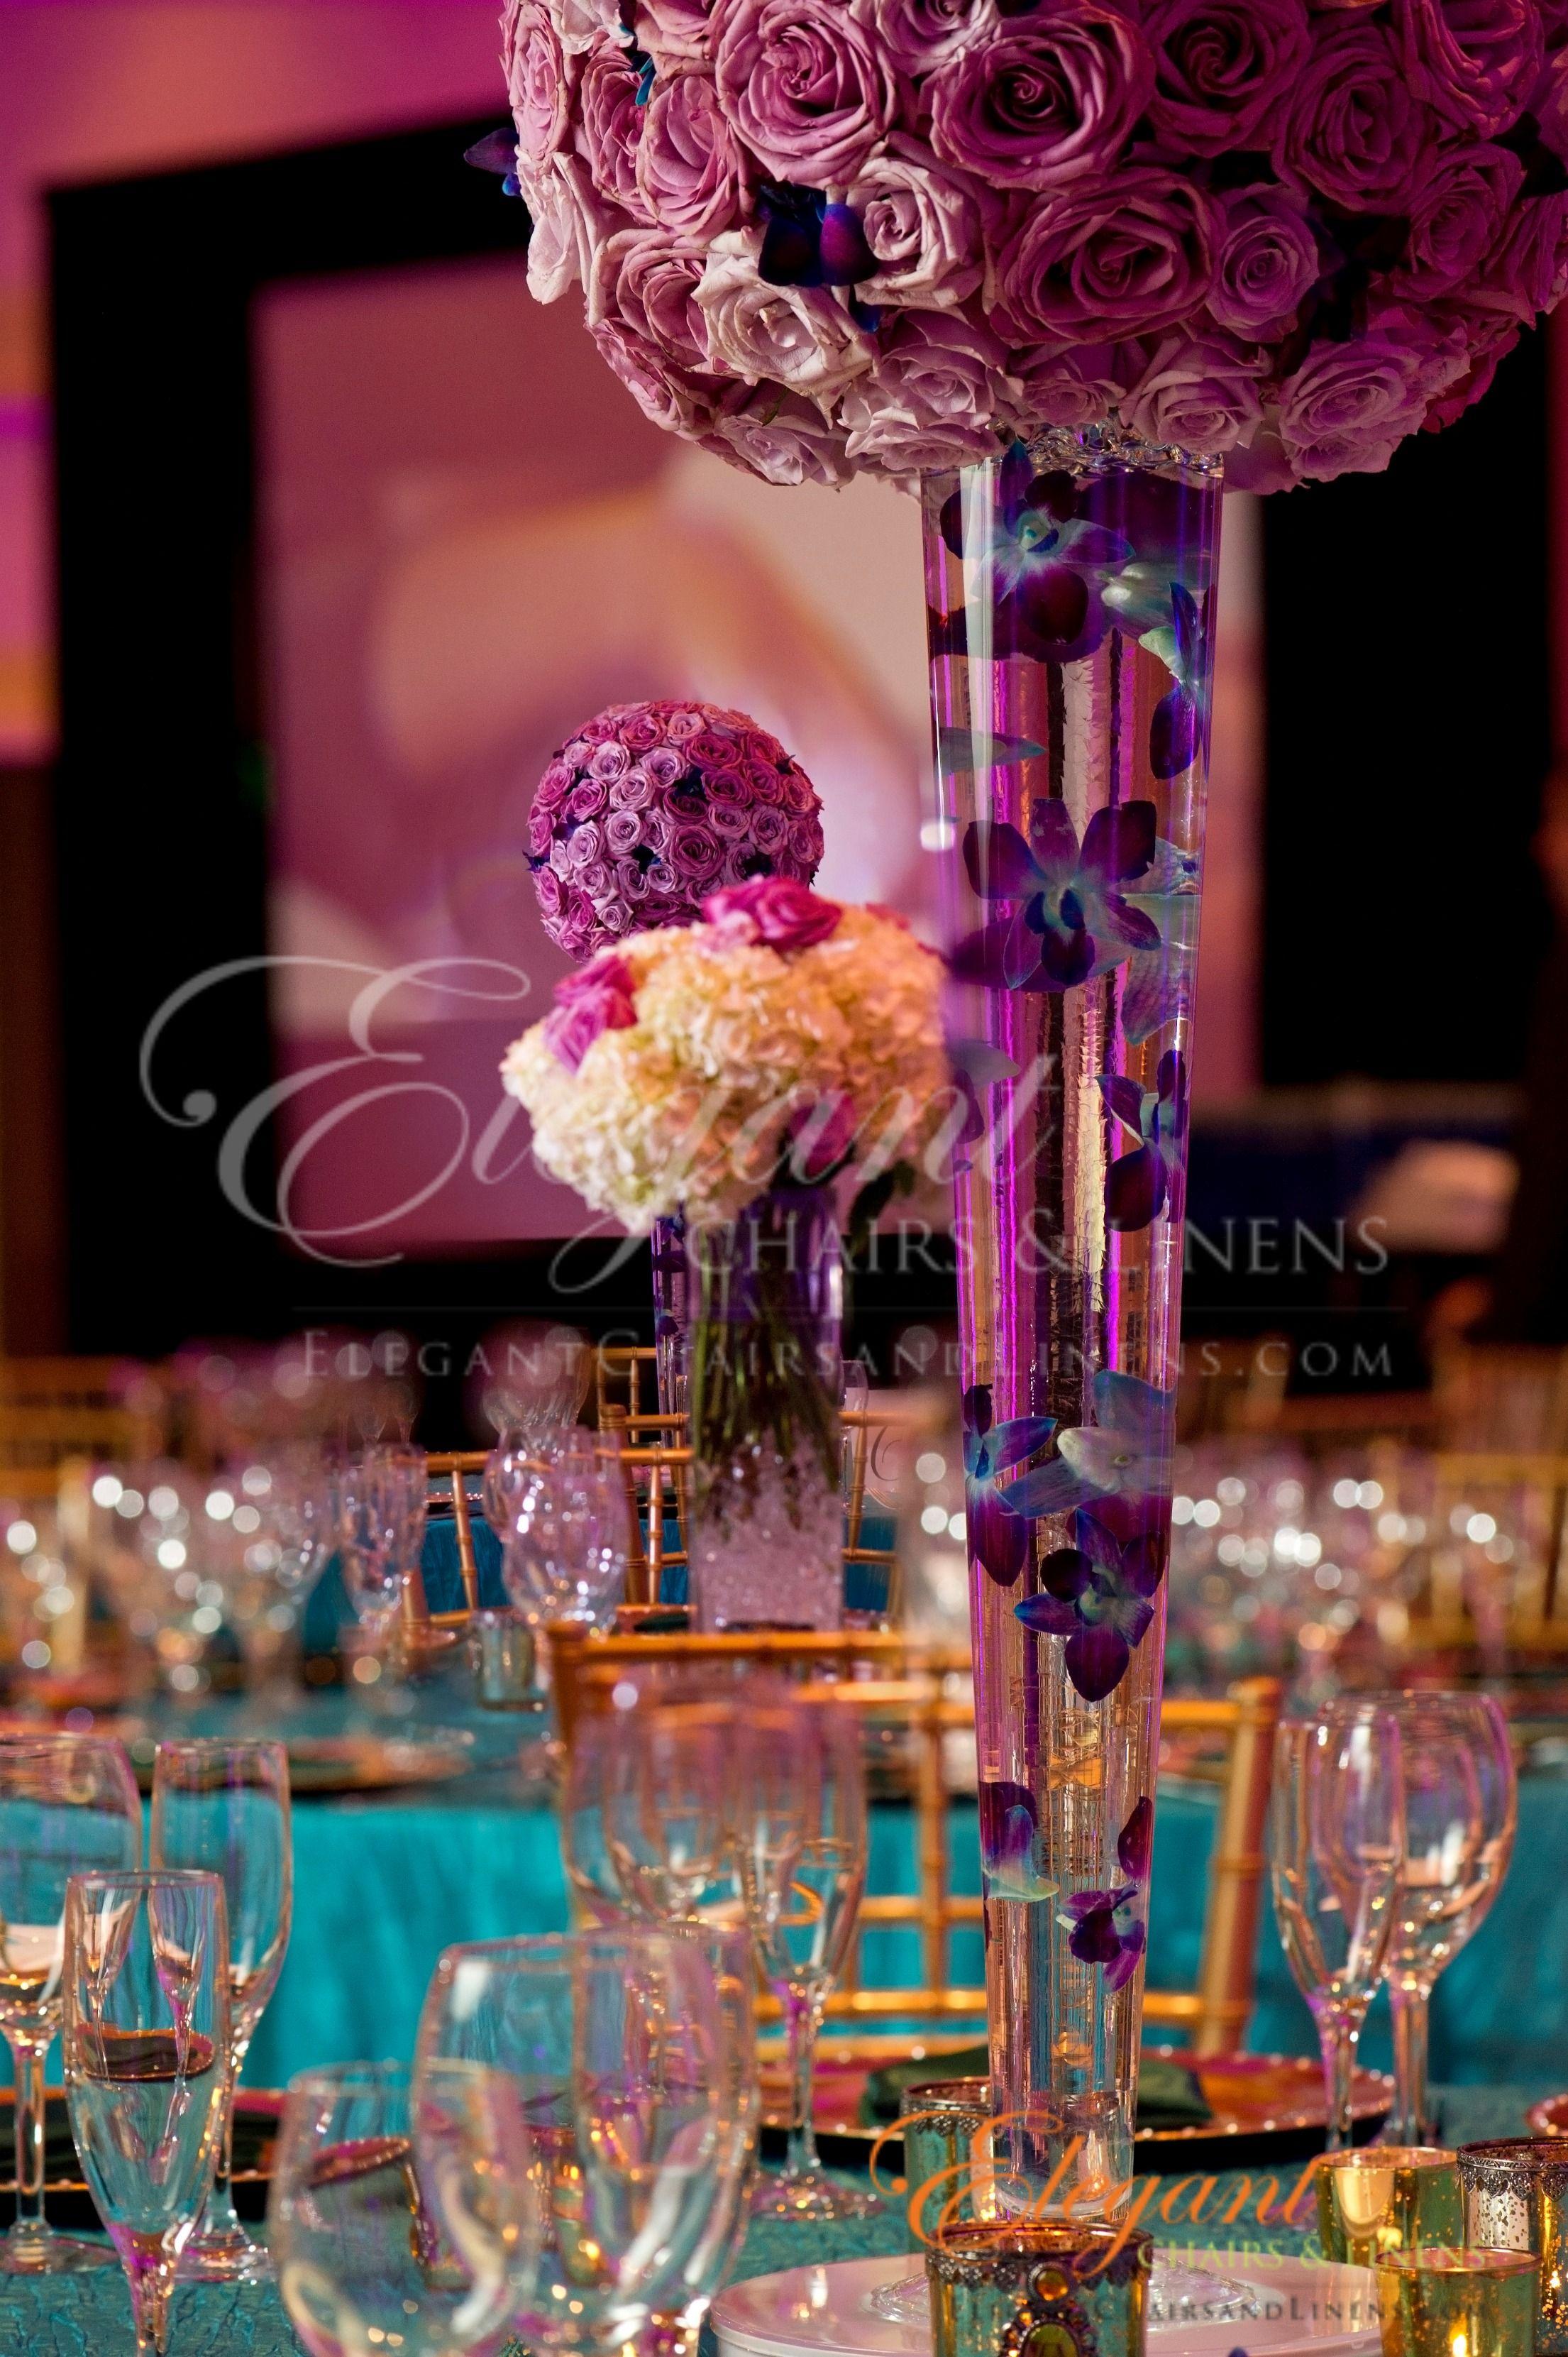 Wedding And Event Linens In Atlanta Ga Linens And Chiavari Chair Rental Atlanta Ga Www Elegantchairsandl Reception Decorations Linen Rentals Wedding Linens